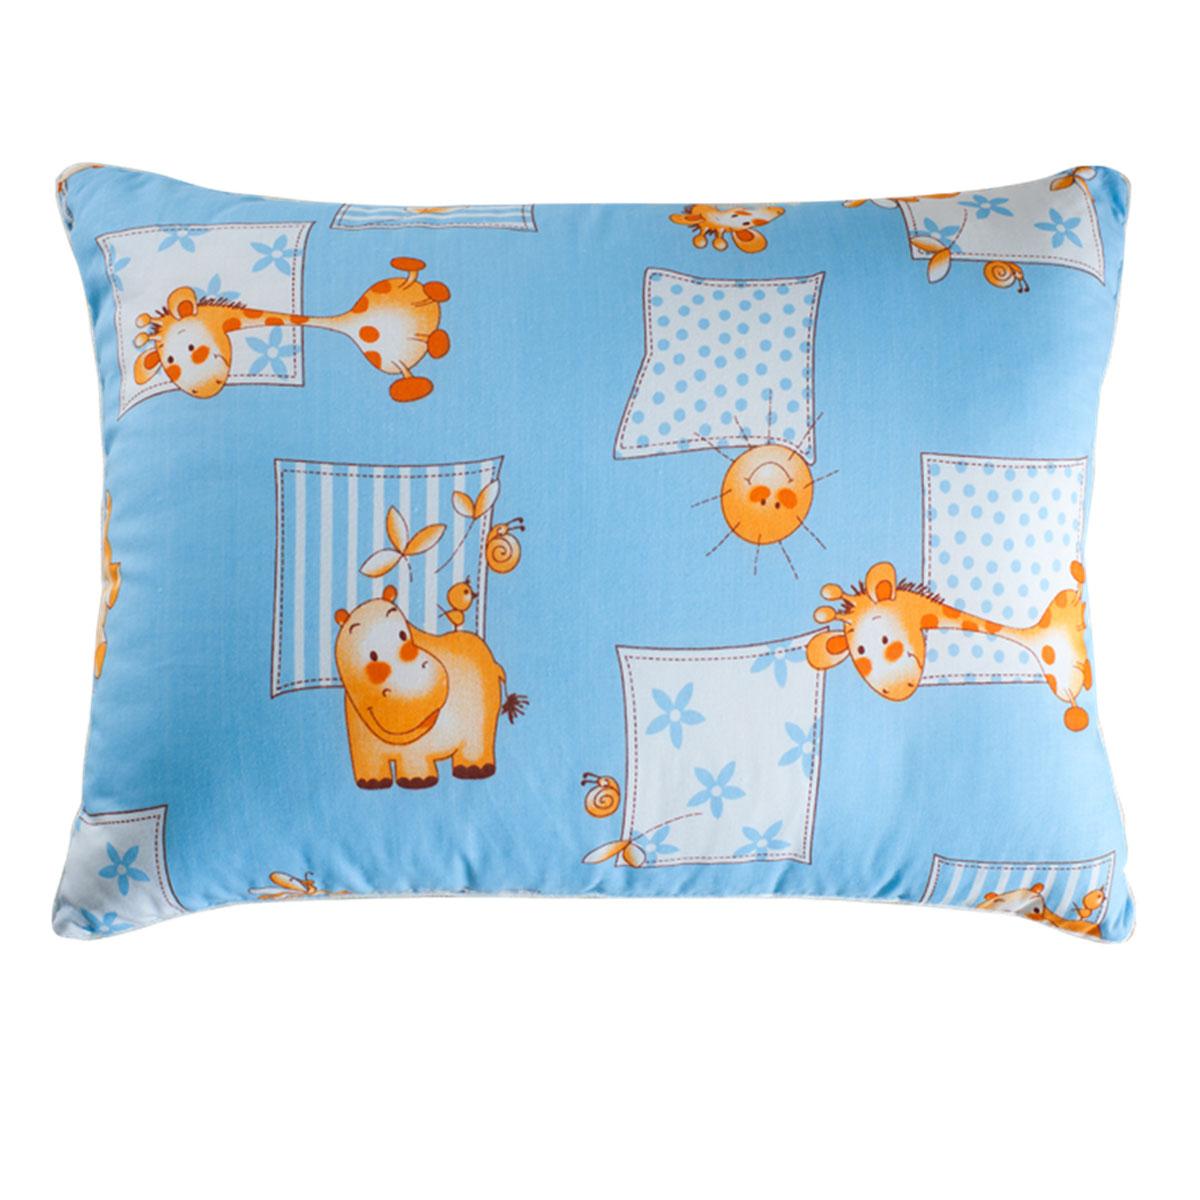 Подушка детская Подушкино Лежебока, цвет: голубой, 40 см х 60 см111012060-ХИ18П